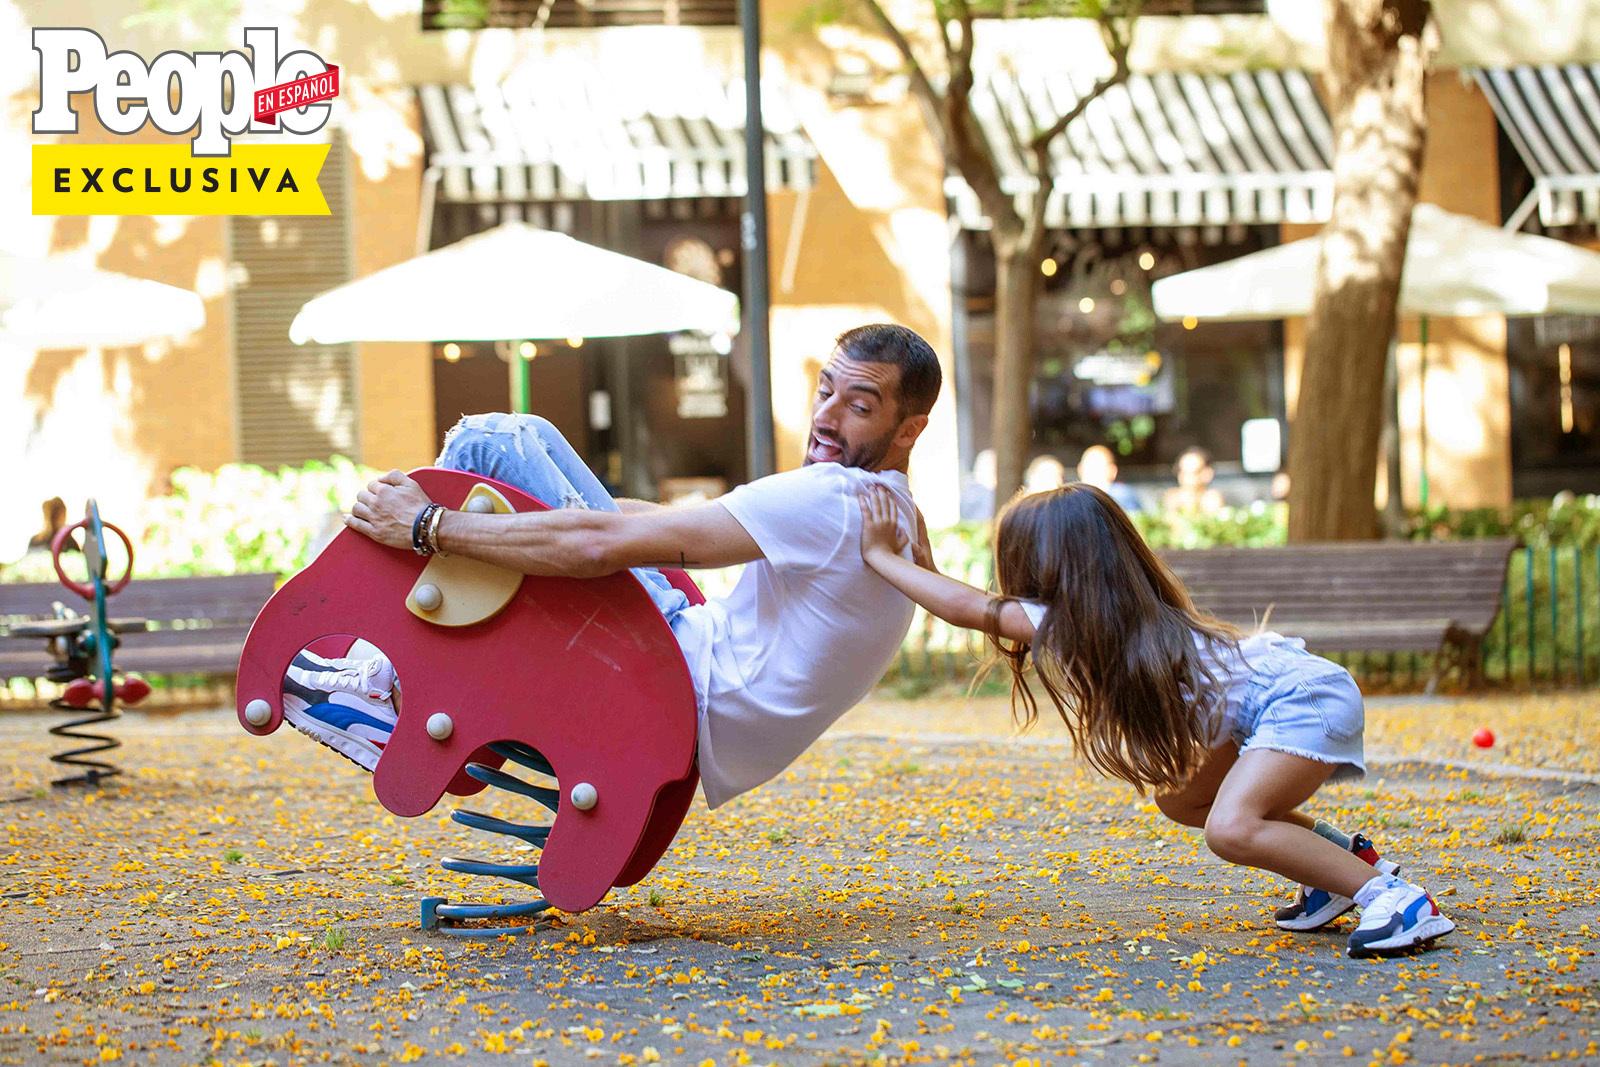 Toni Costa, Alaia Digital Cover - DO NOT REUSE